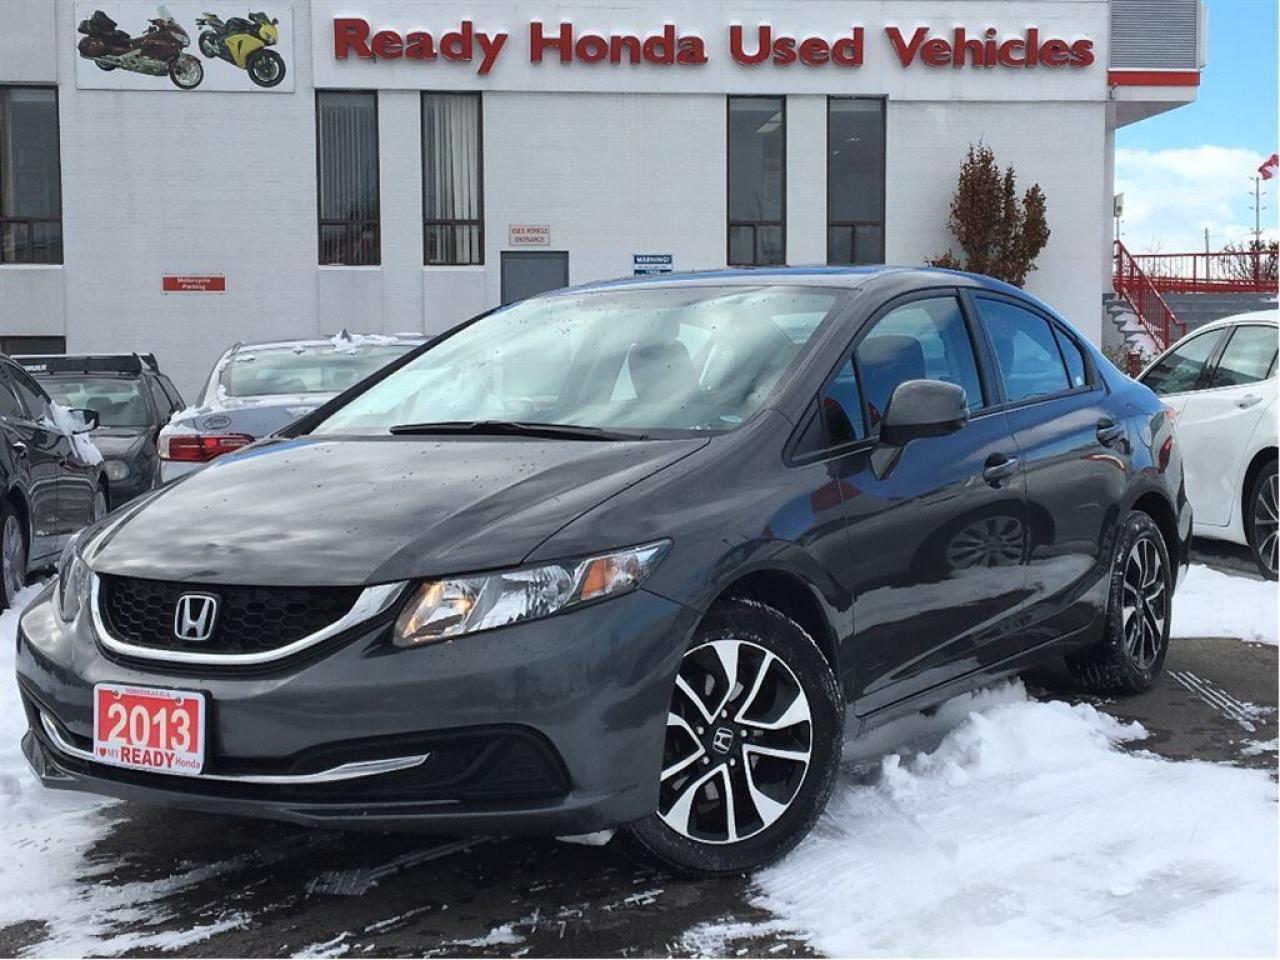 2013 Honda Civic EX - Sunroof - Alloys - Back Up Camera